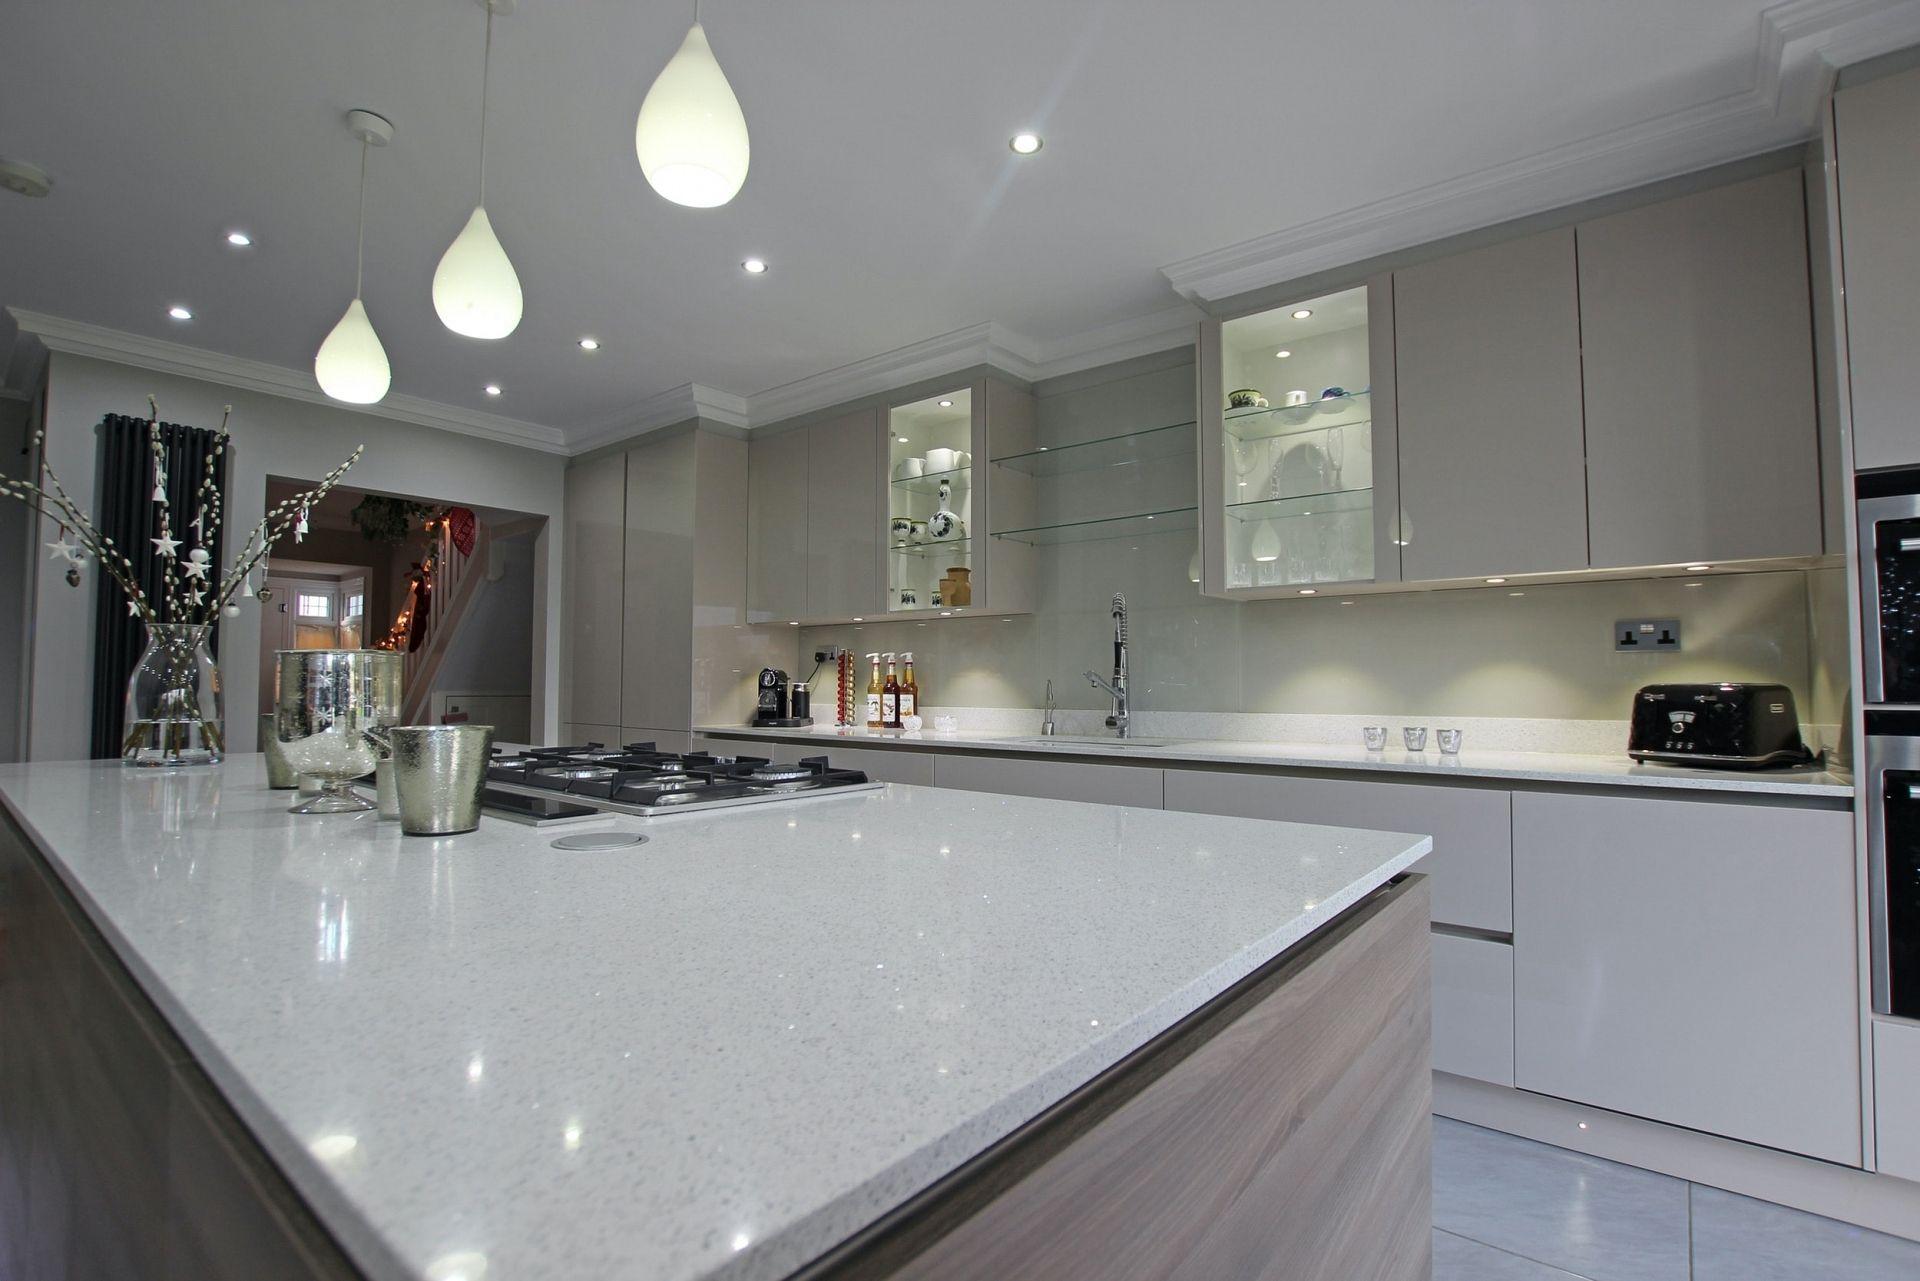 Floating Kitchen Island Design from LWK Kitchens